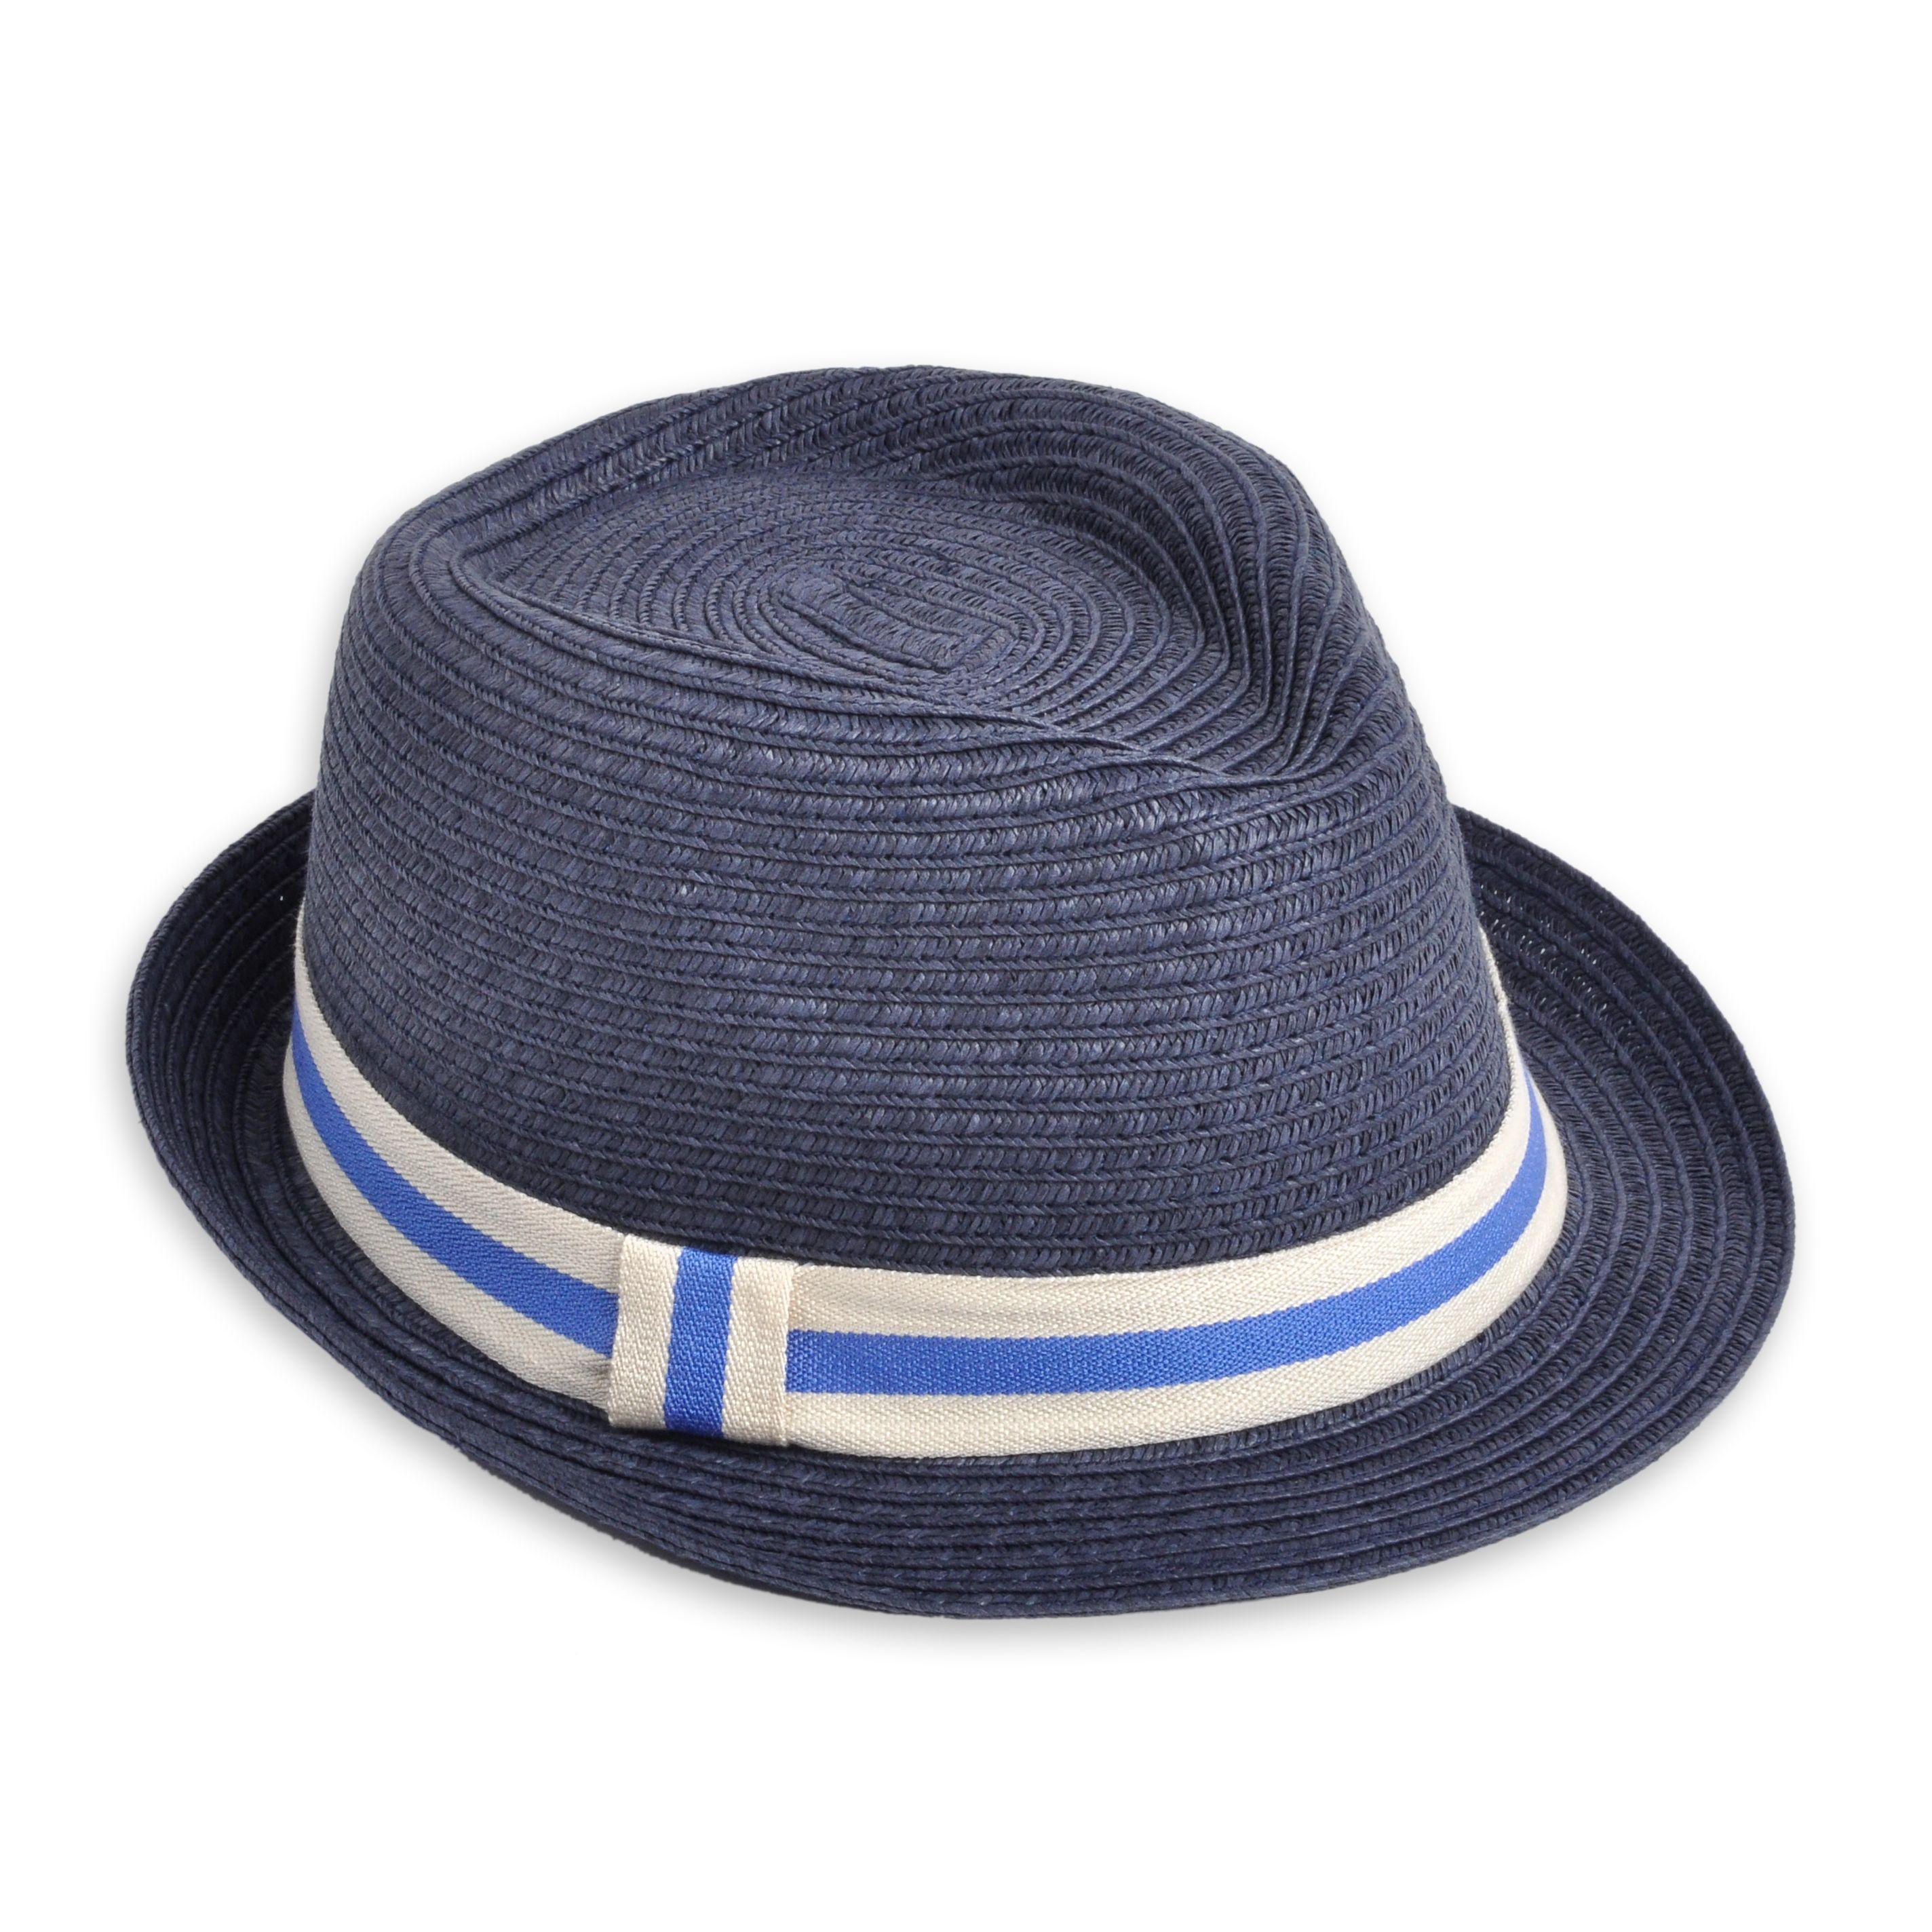 Sombrero EPK para niño de color azul marino con cinta de color azul claro y  blanco. 7769665a96a